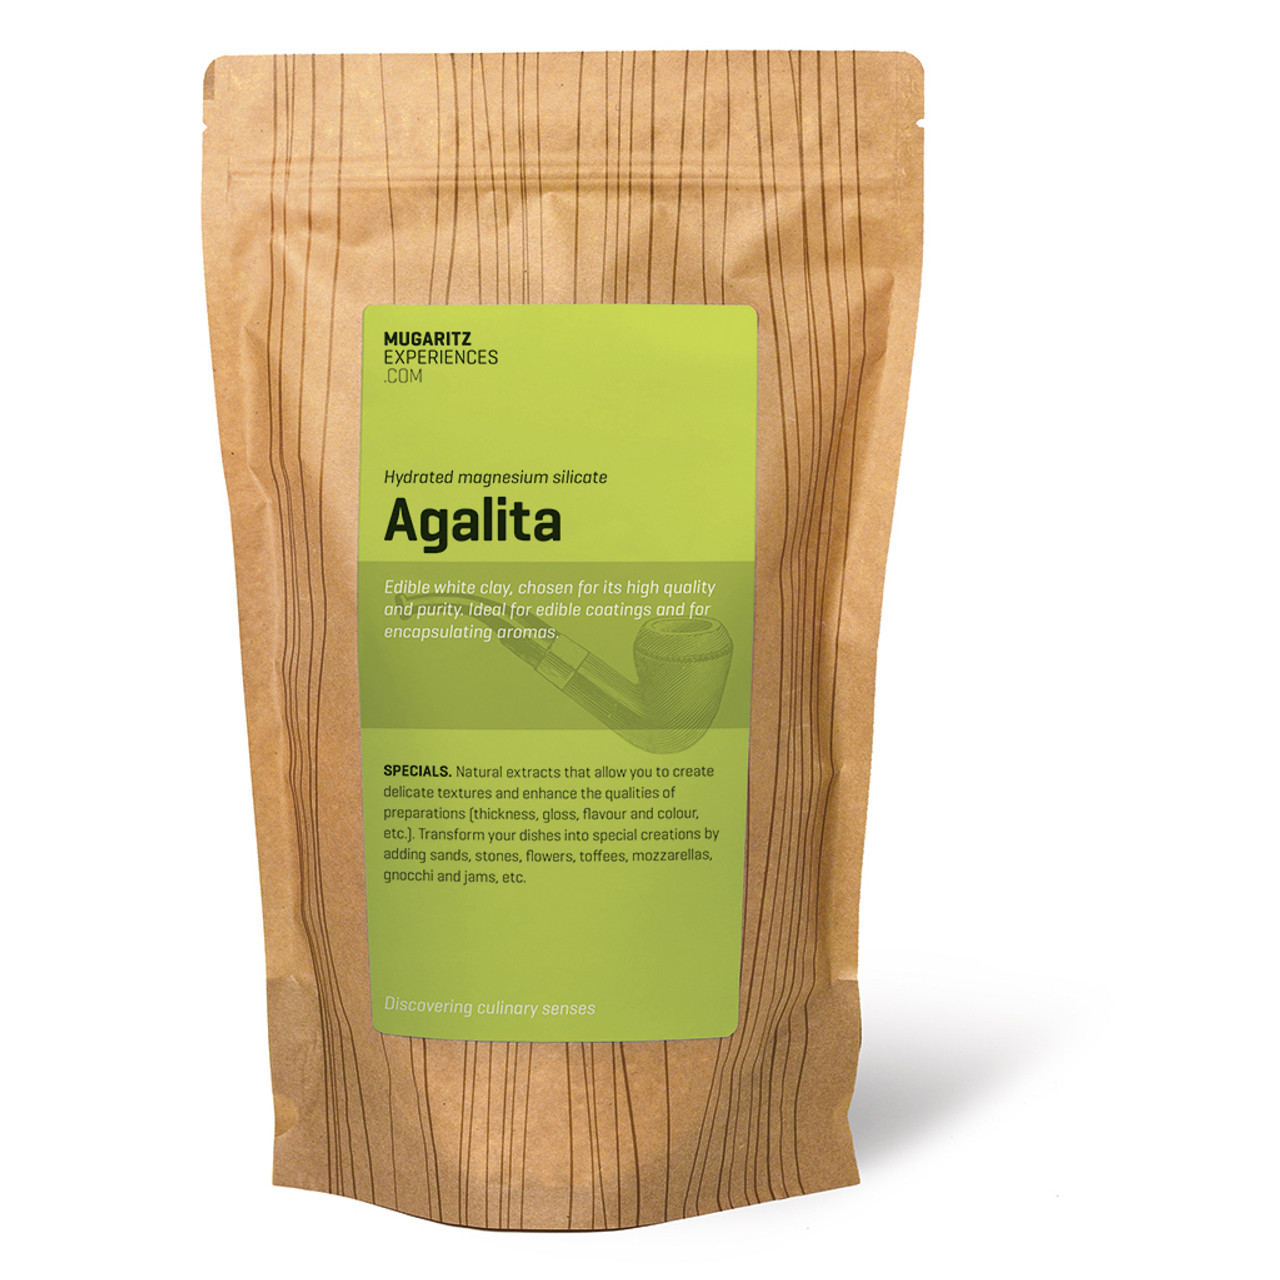 Mugaritz Agalita (Kaolin Replacement) 750g